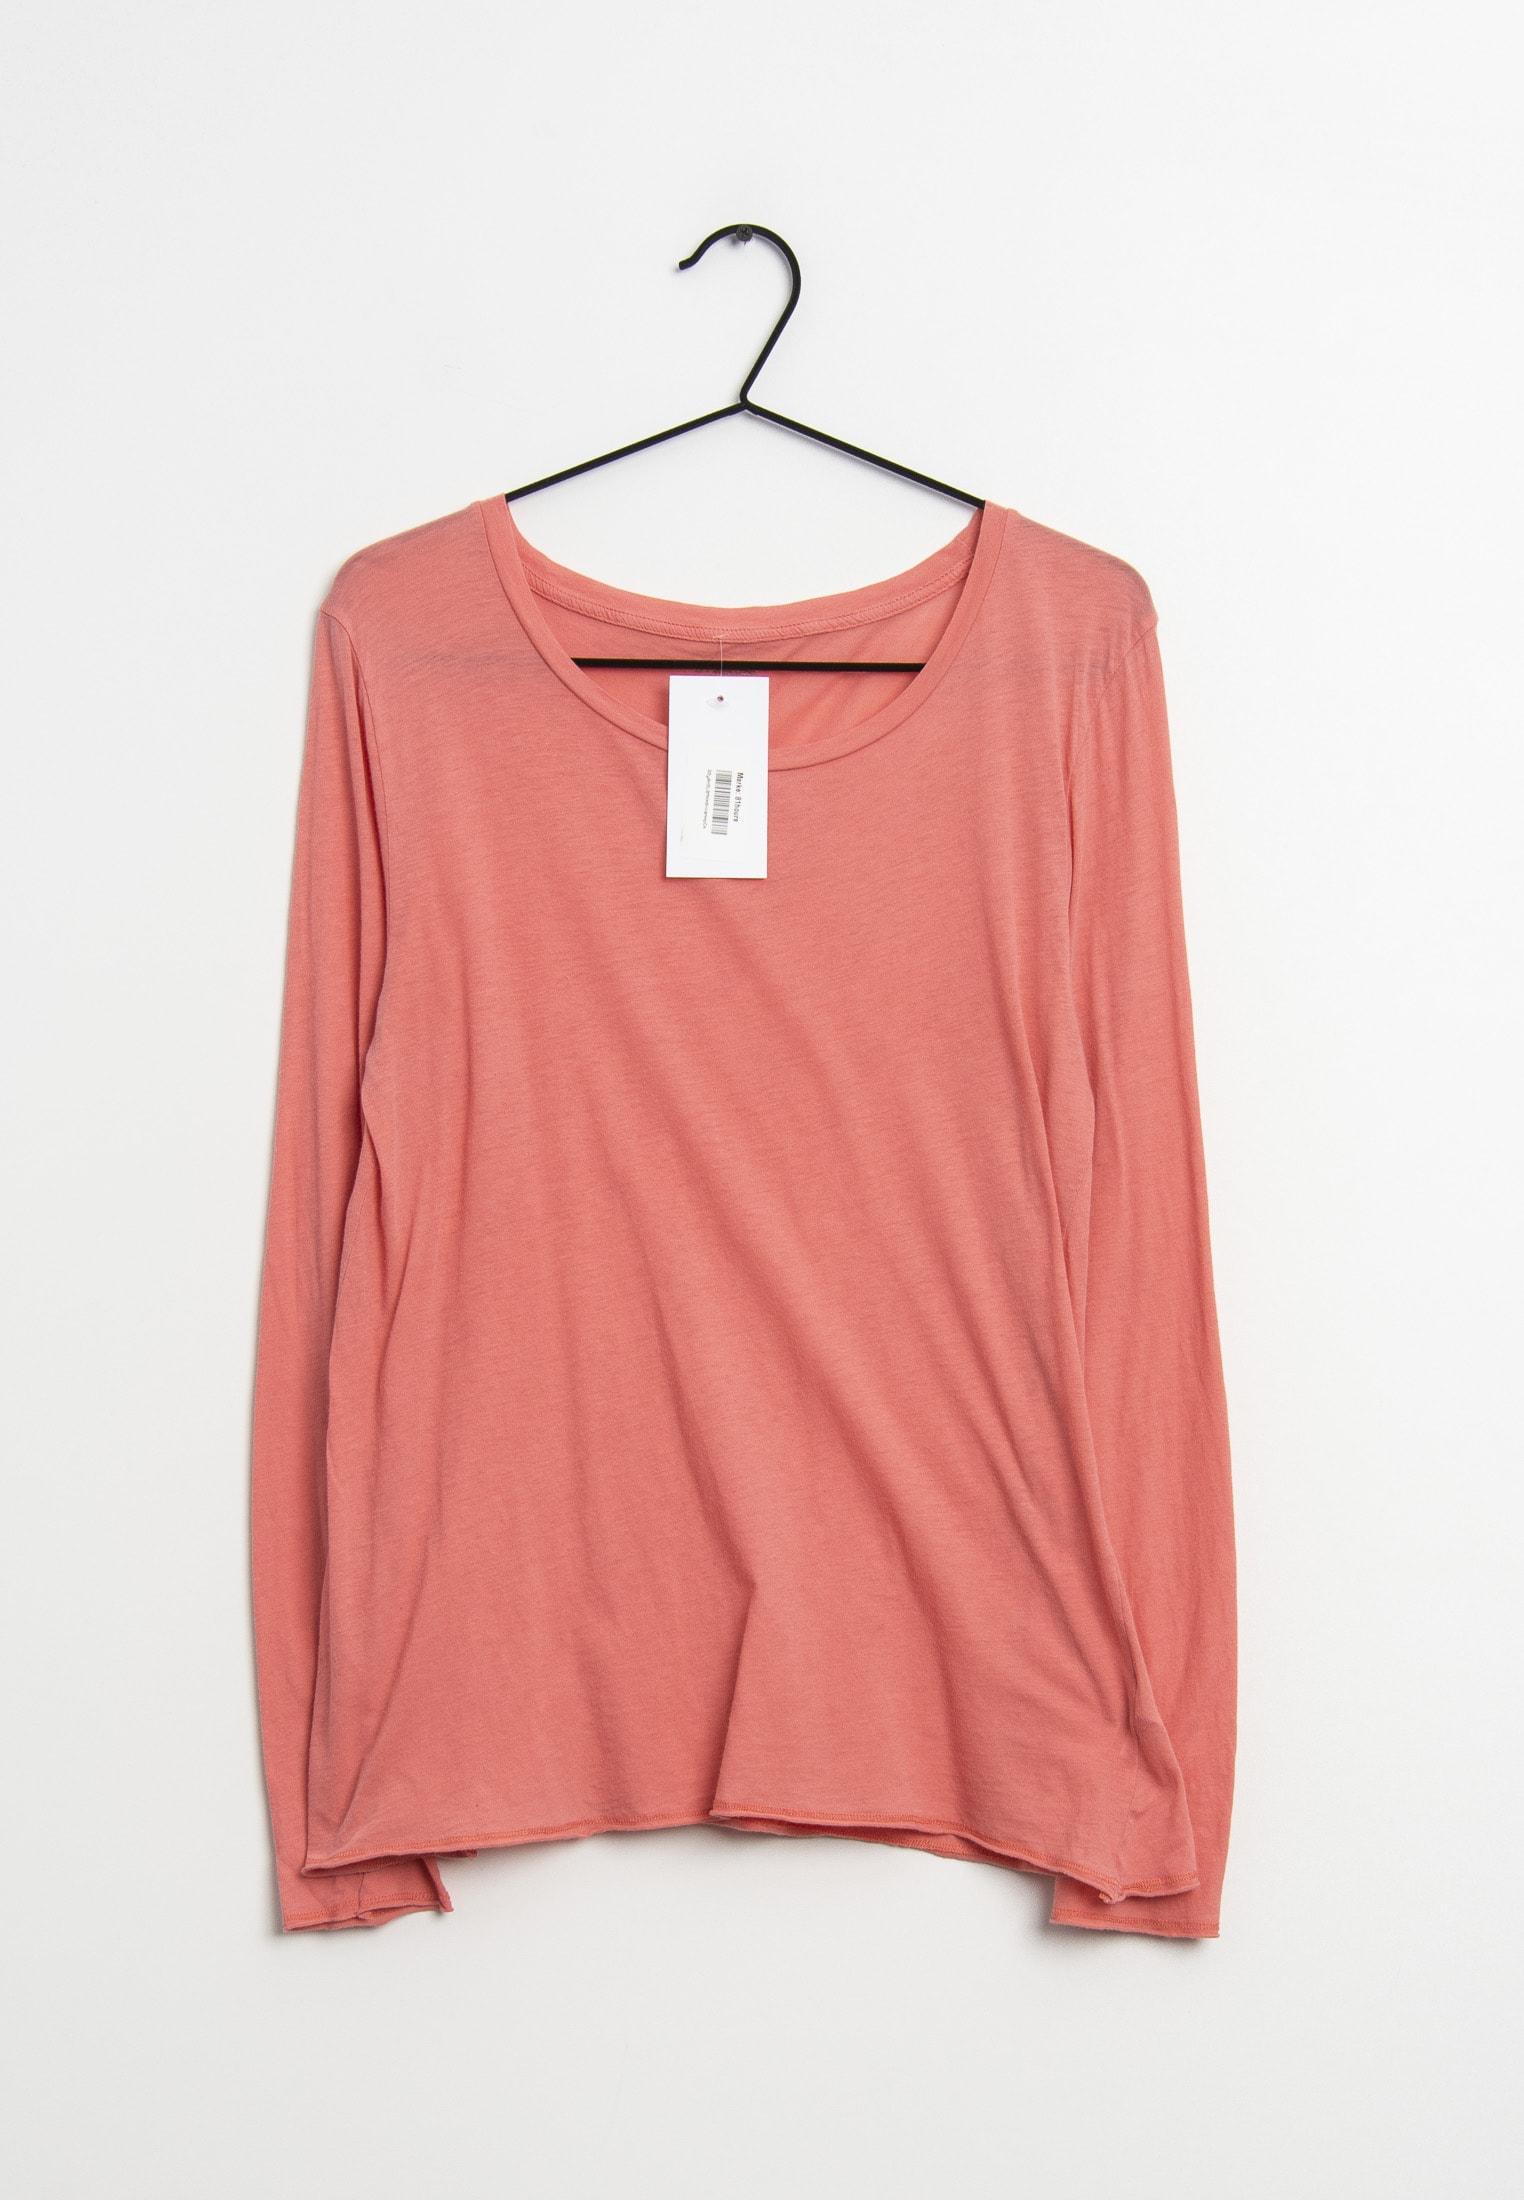 81hours Langarmshirt Pink Gr.L